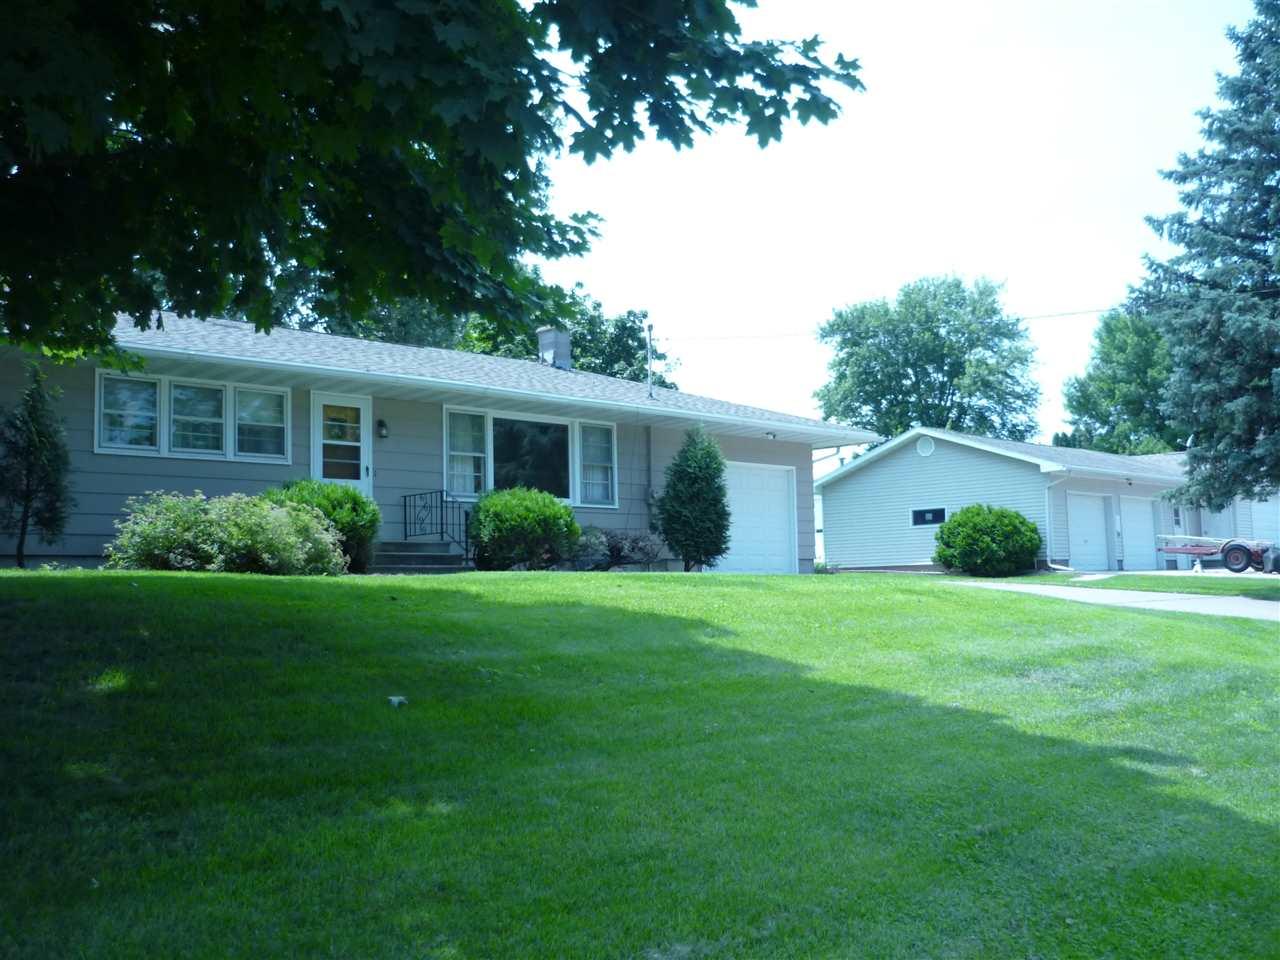 Real Estate for Sale, ListingId: 31046712, Bellevue,IA52031